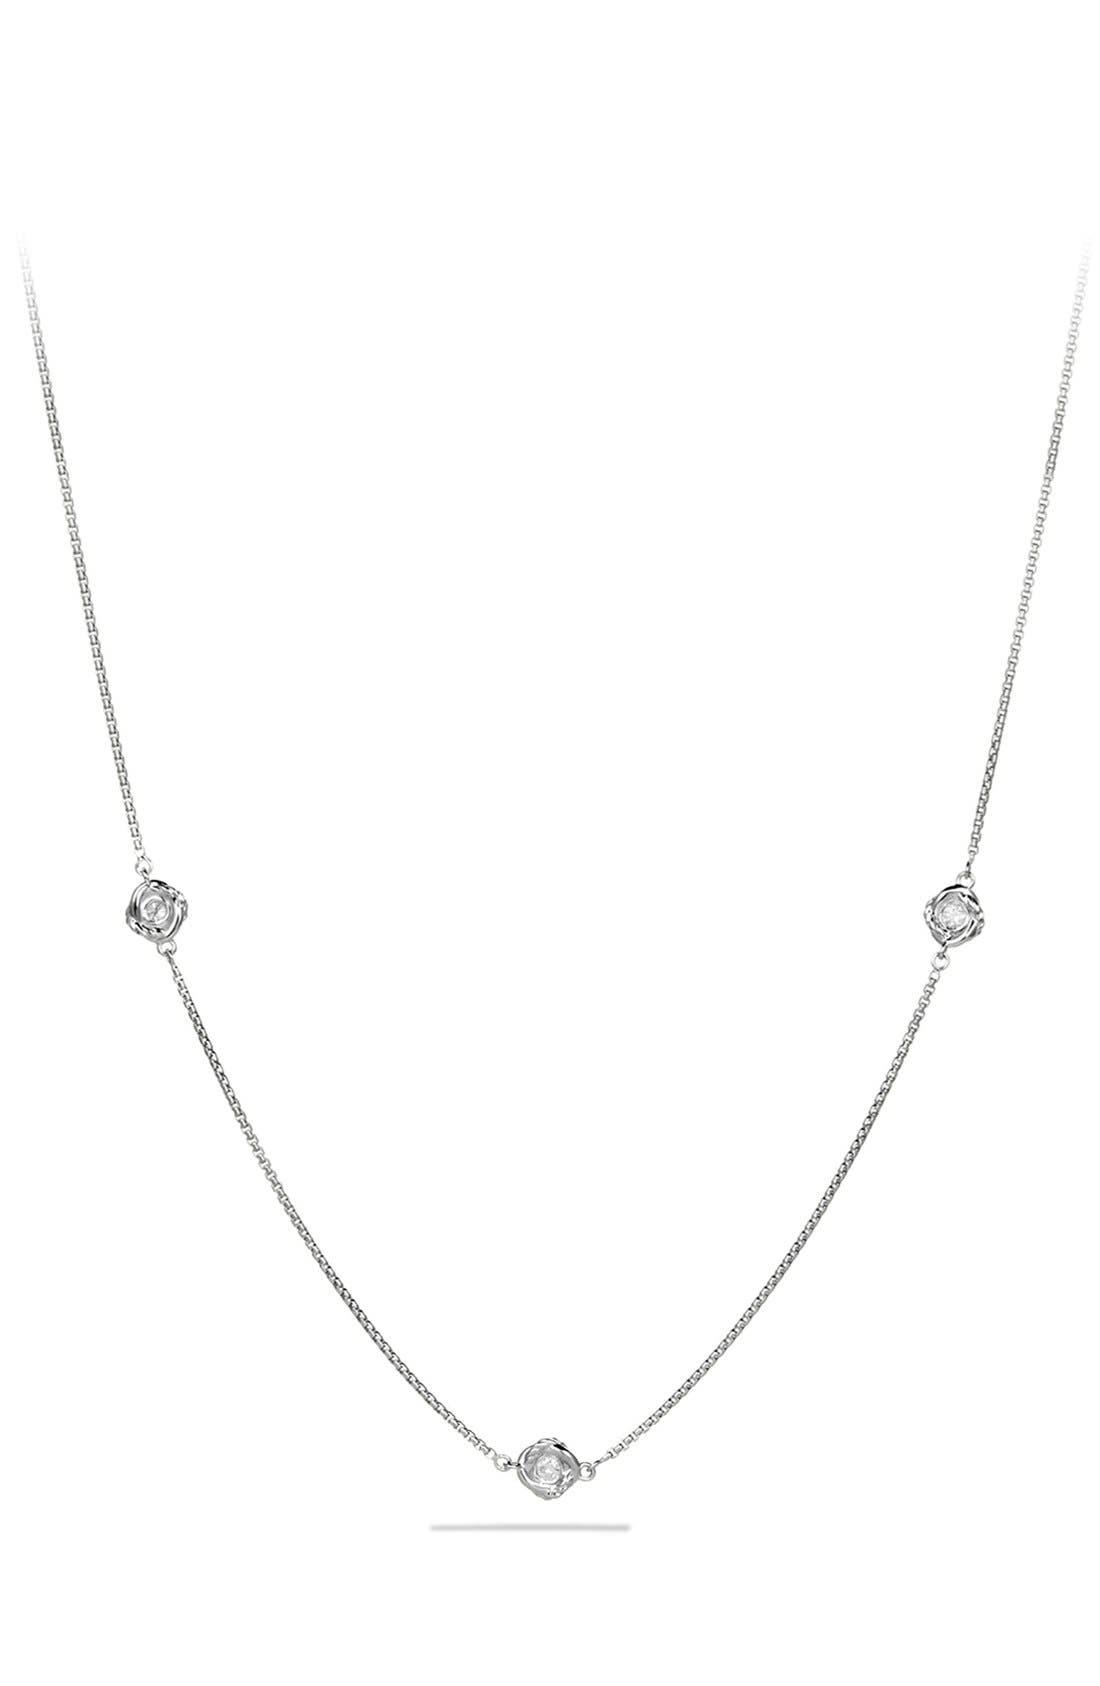 Alternate Image 1 Selected - David Yurman 'Infinity' Necklace with Diamonds